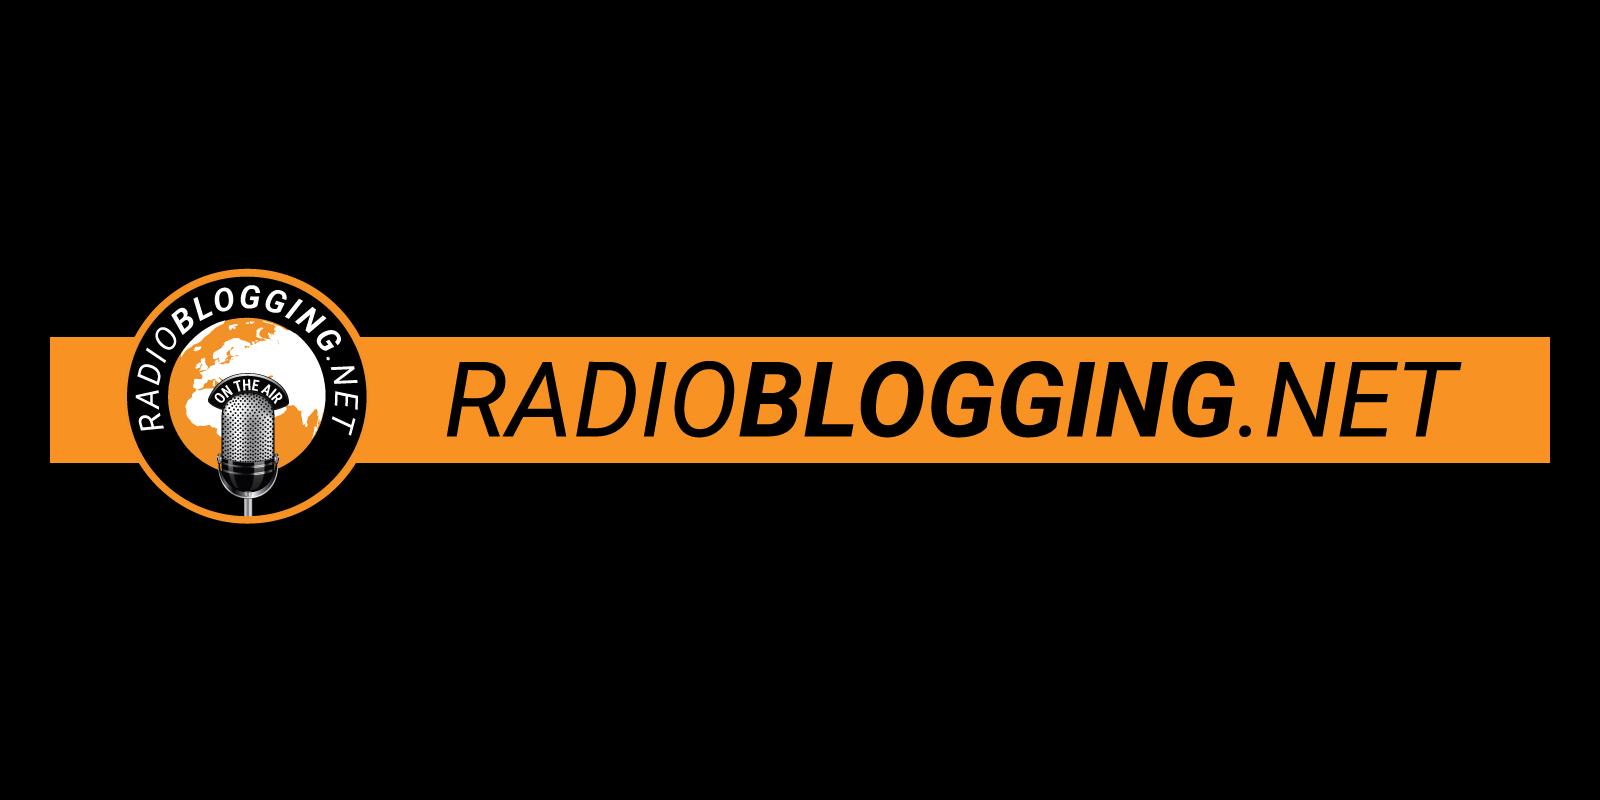 RadioBlogging.Net